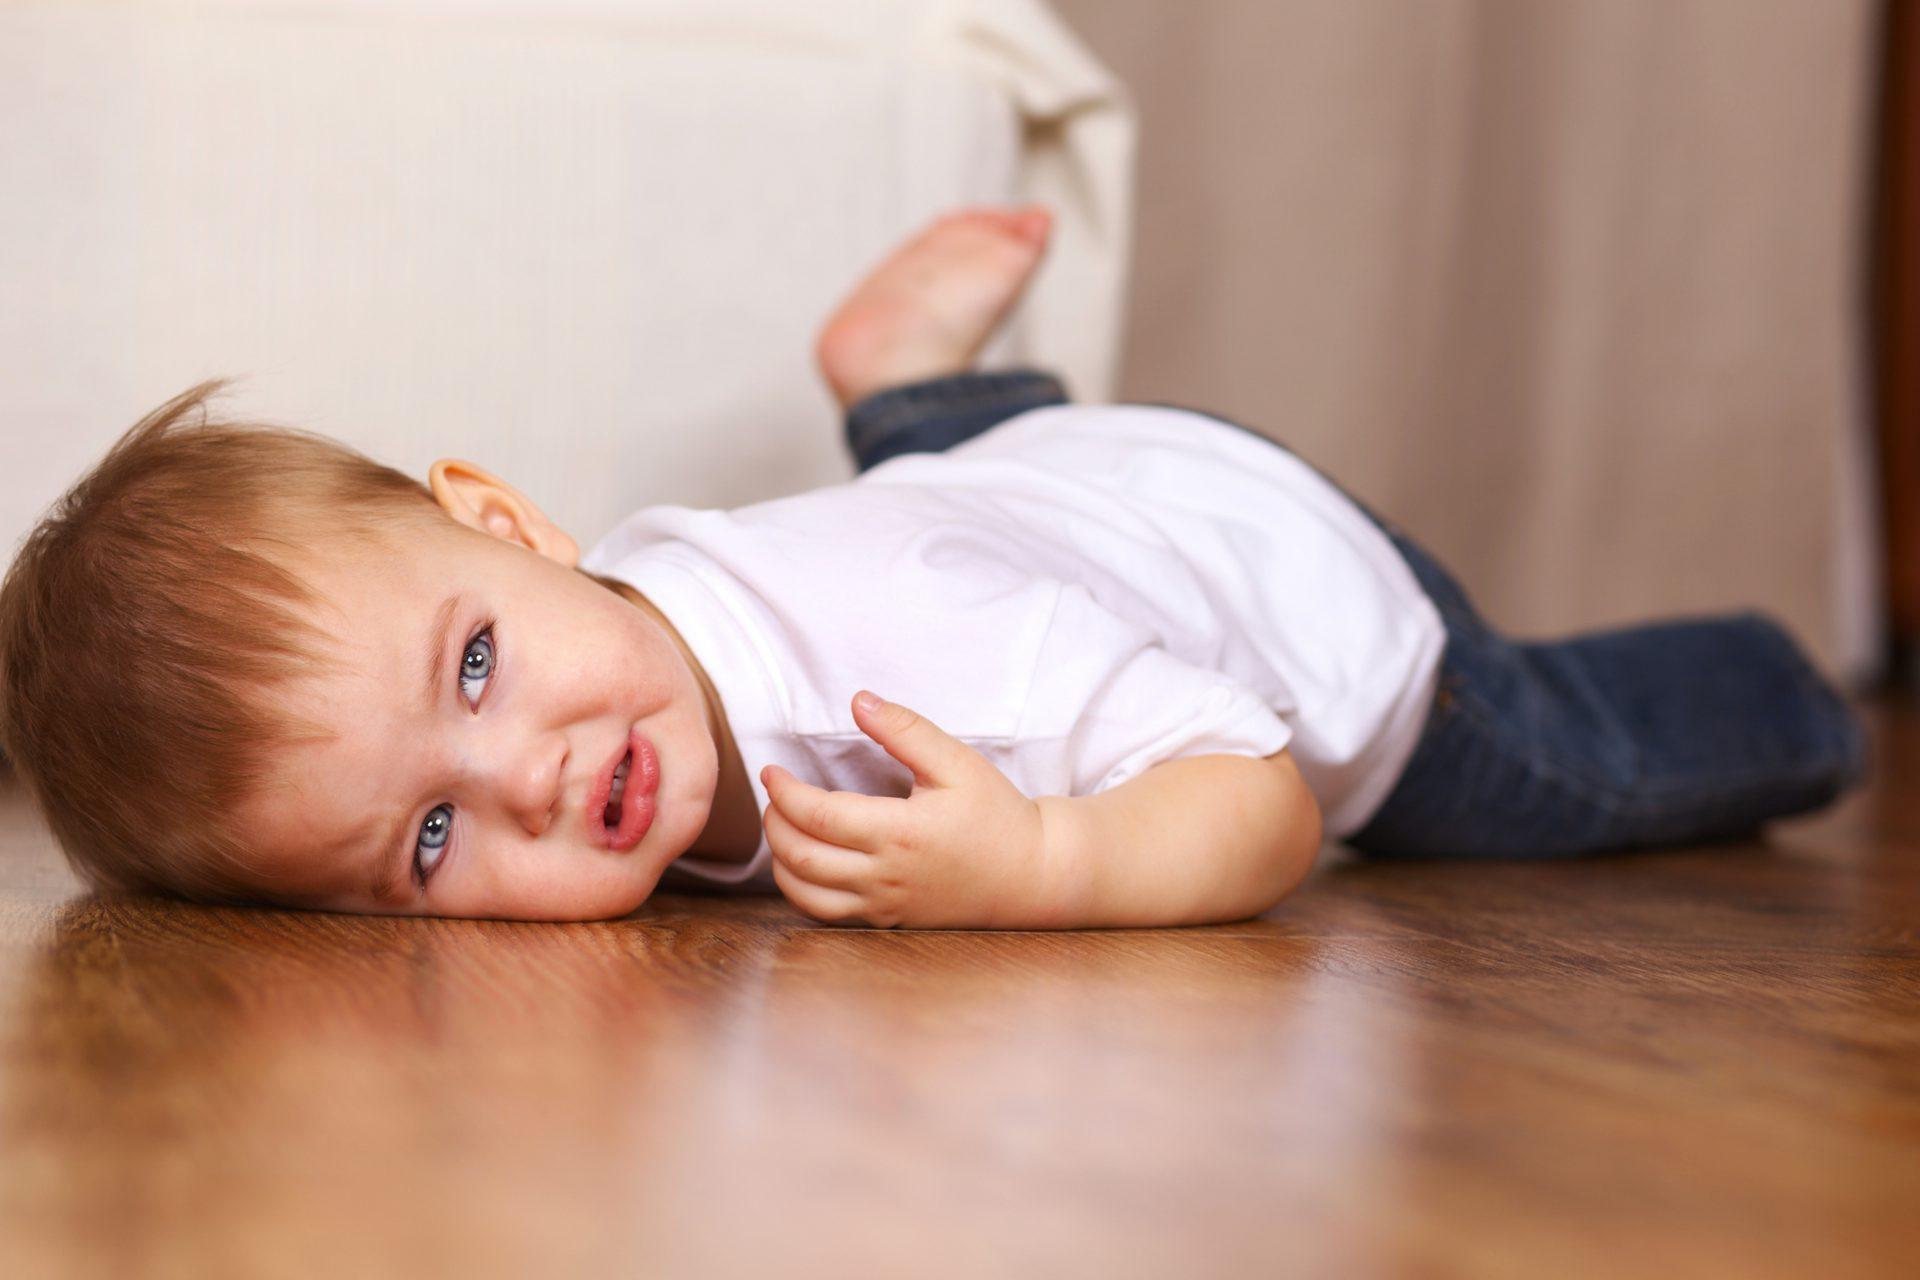 Photo of برجاء الاهتمام بالطفل حتي وإن كان كلما غضب يرمى نفسه على الارض